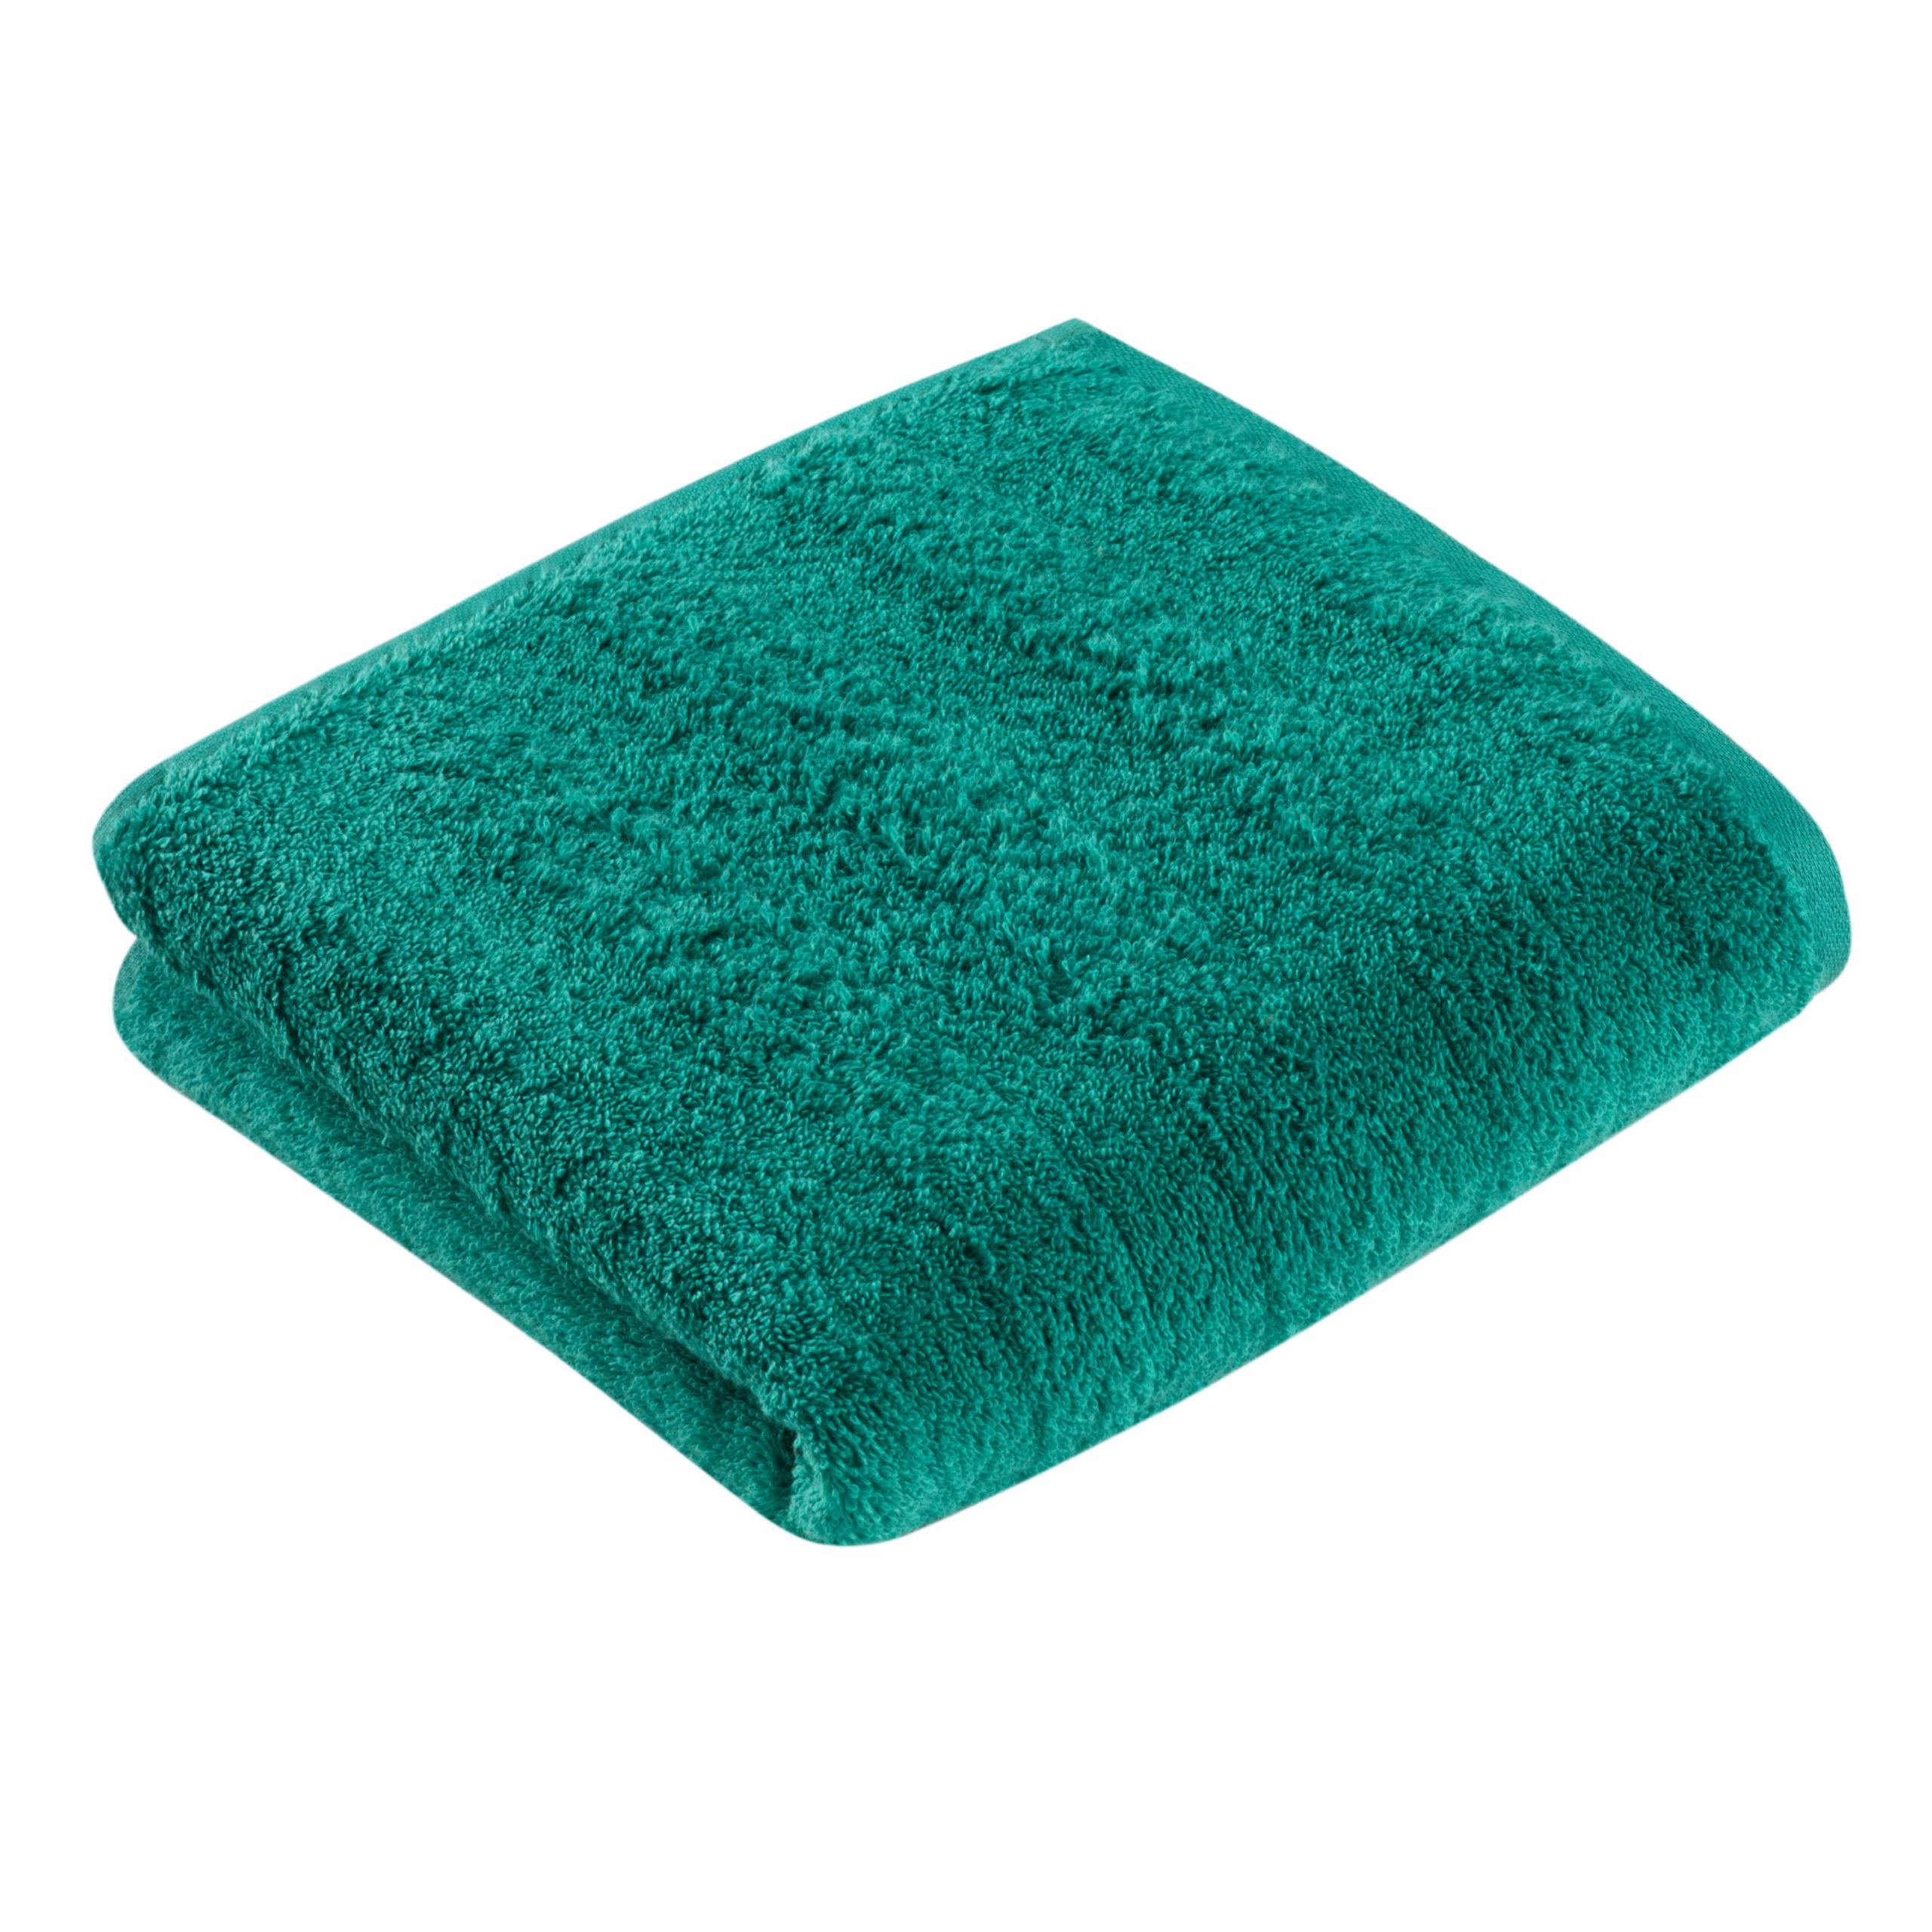 Vossen ręcznik fresh 5845 ocean teal